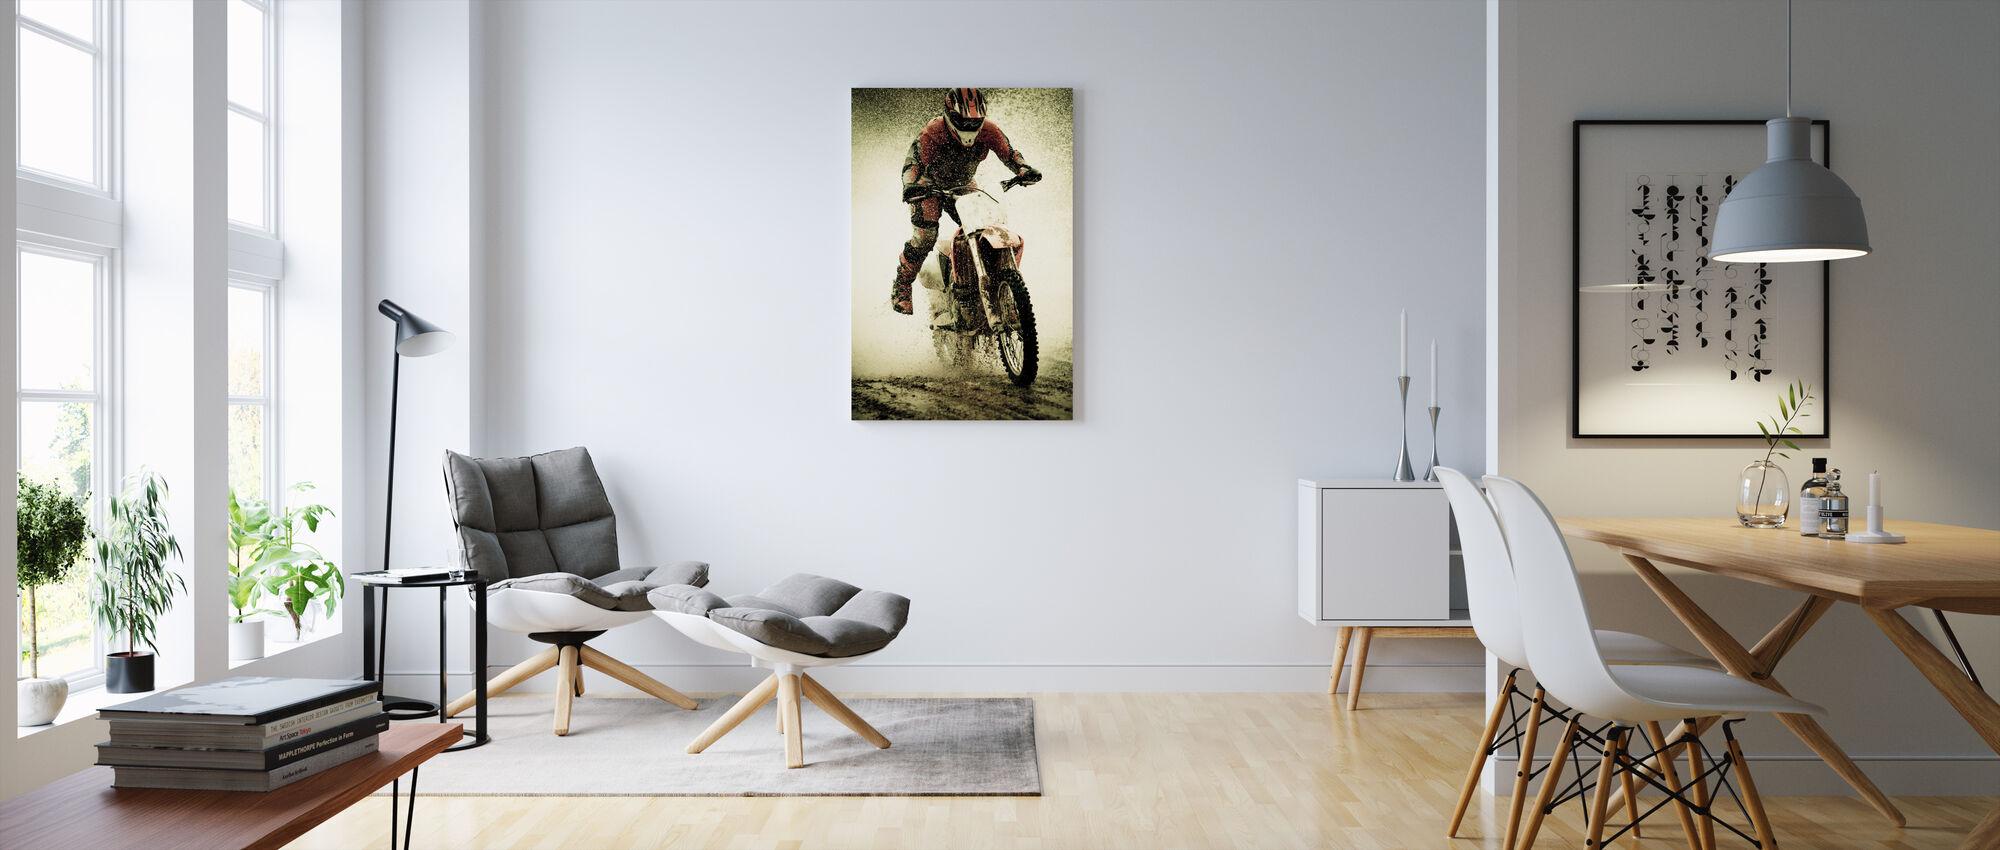 Motocross - Canvastaulu - Olohuone